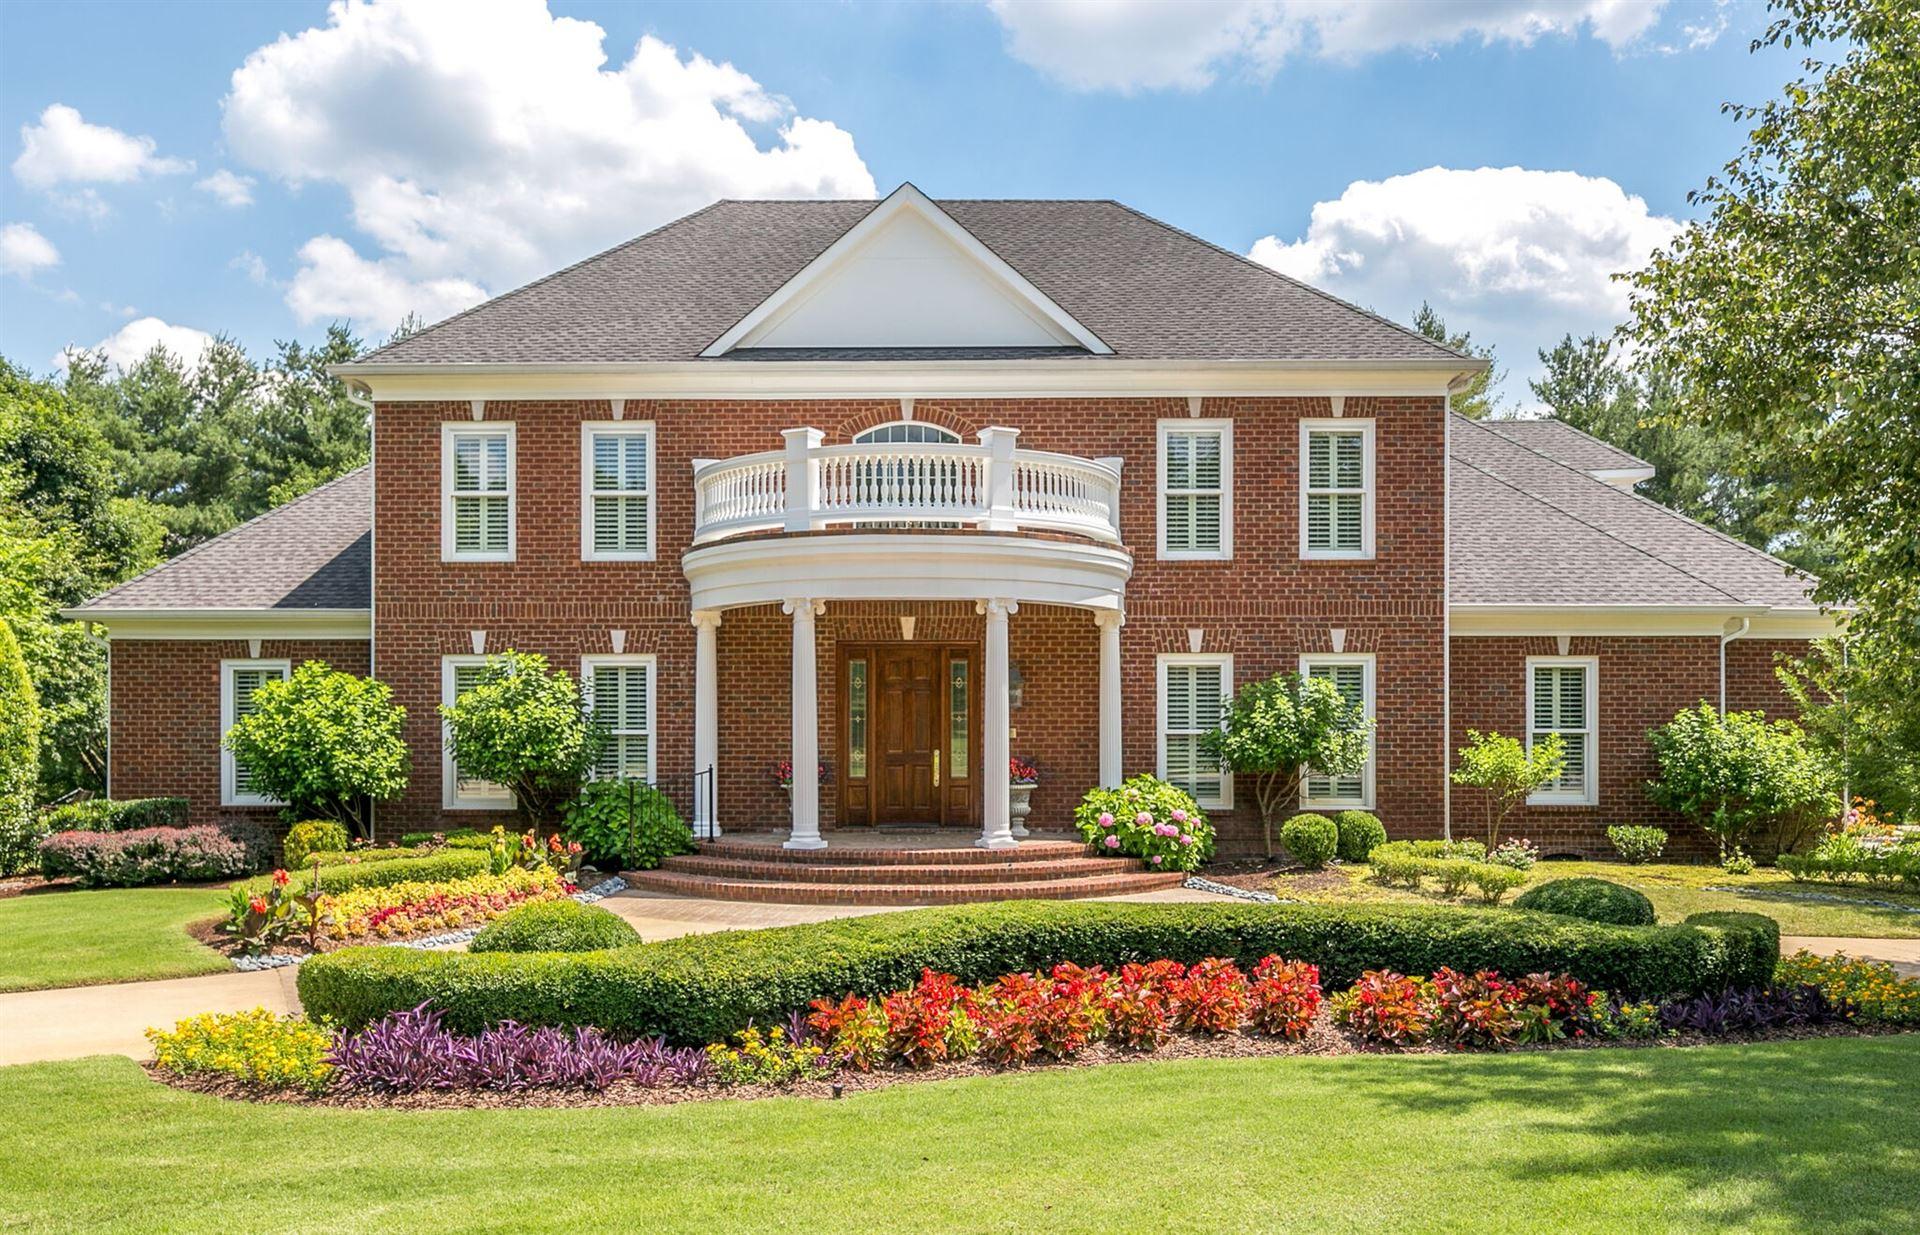 1410 Broadlands Dr, Murfreesboro, TN 37130 - MLS#: 2265062